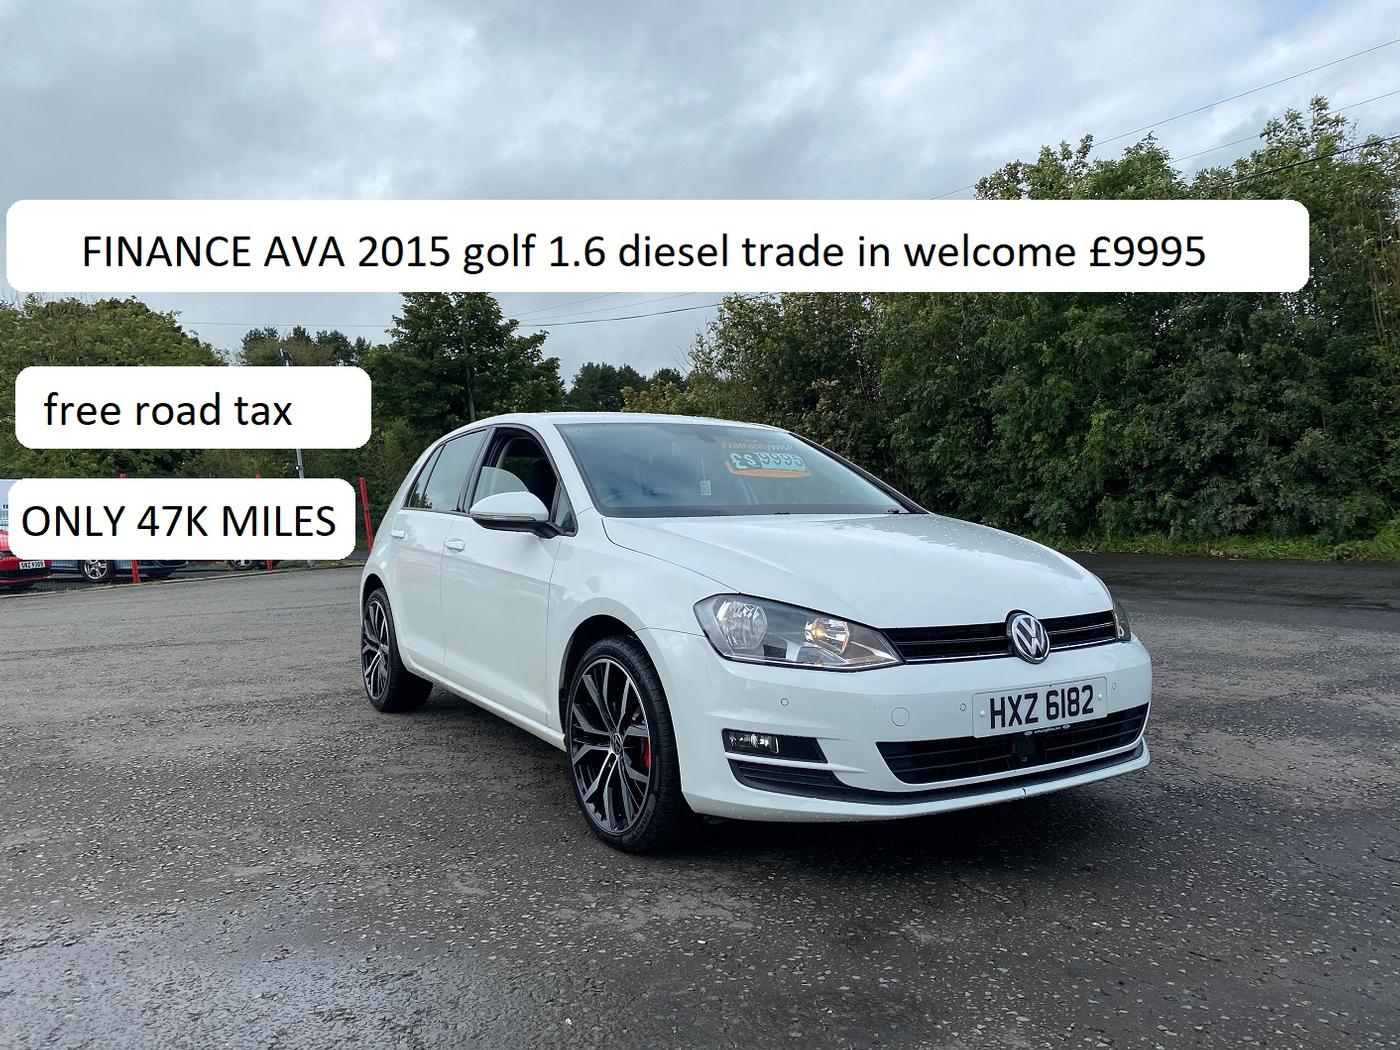 2015 golf 1.6 diesel